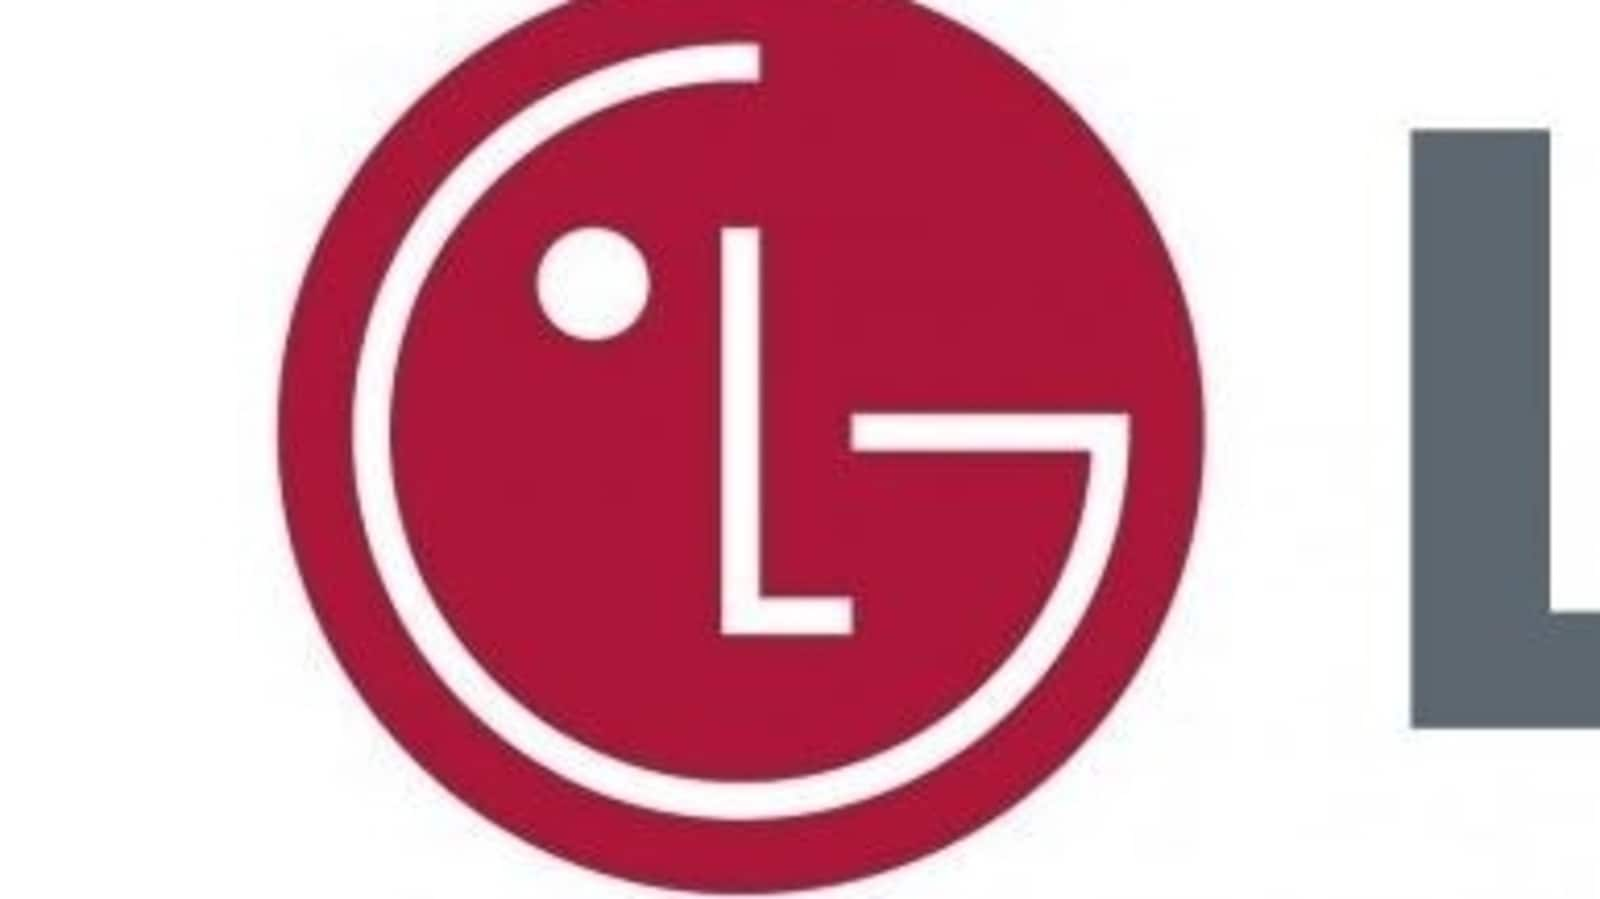 LG stops manufacturing phones: report it